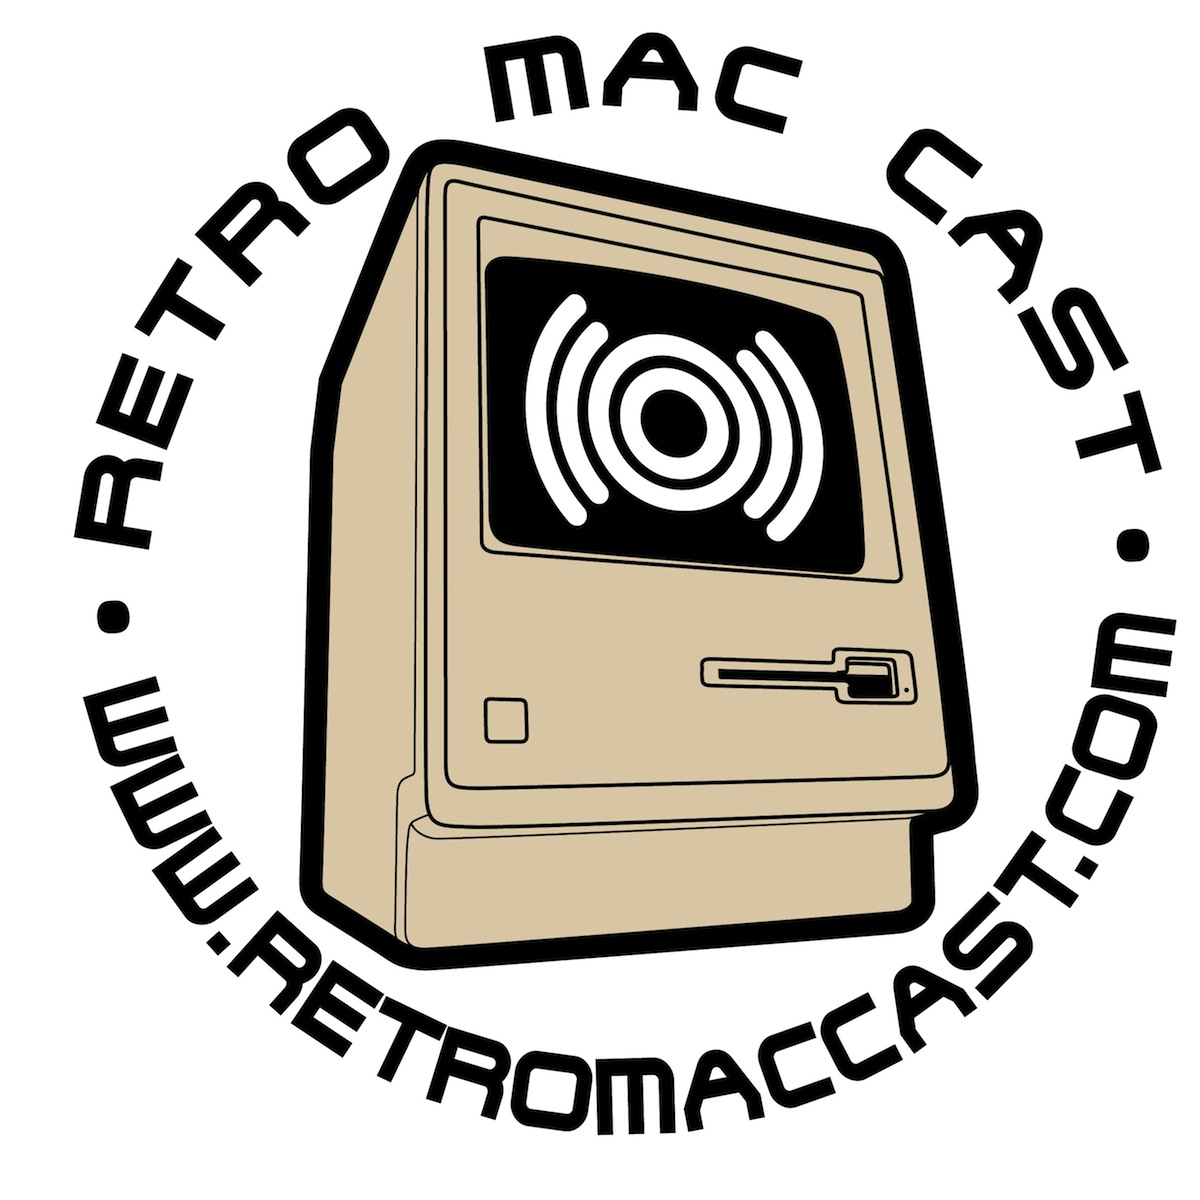 Artwork for Episode 127: Apple IIGS Emulators